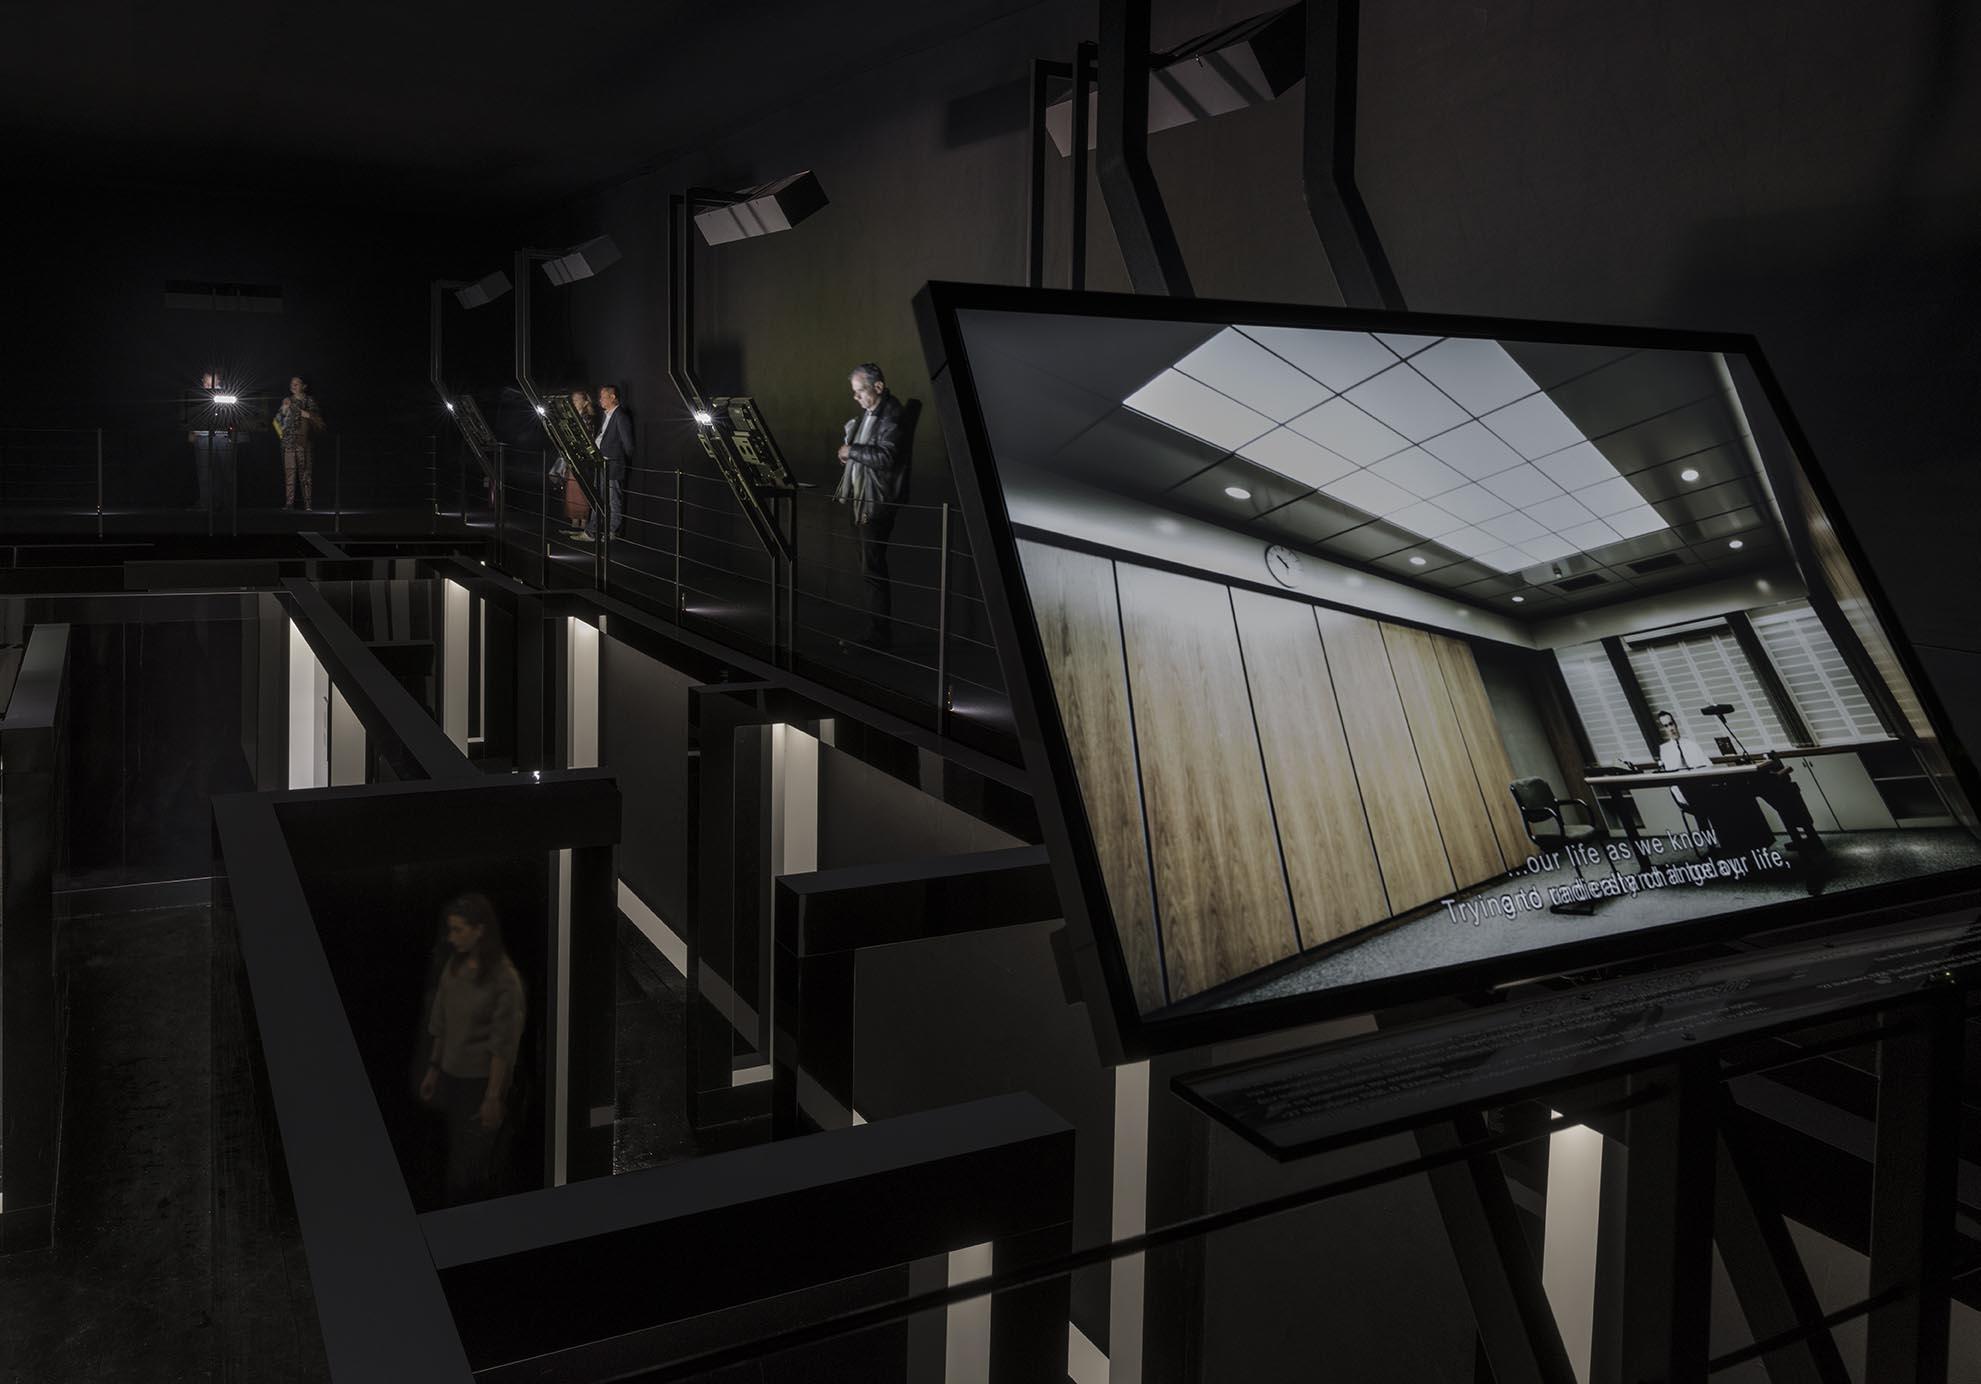 Biennale_Laboratory of Dilemmas, George Drivas